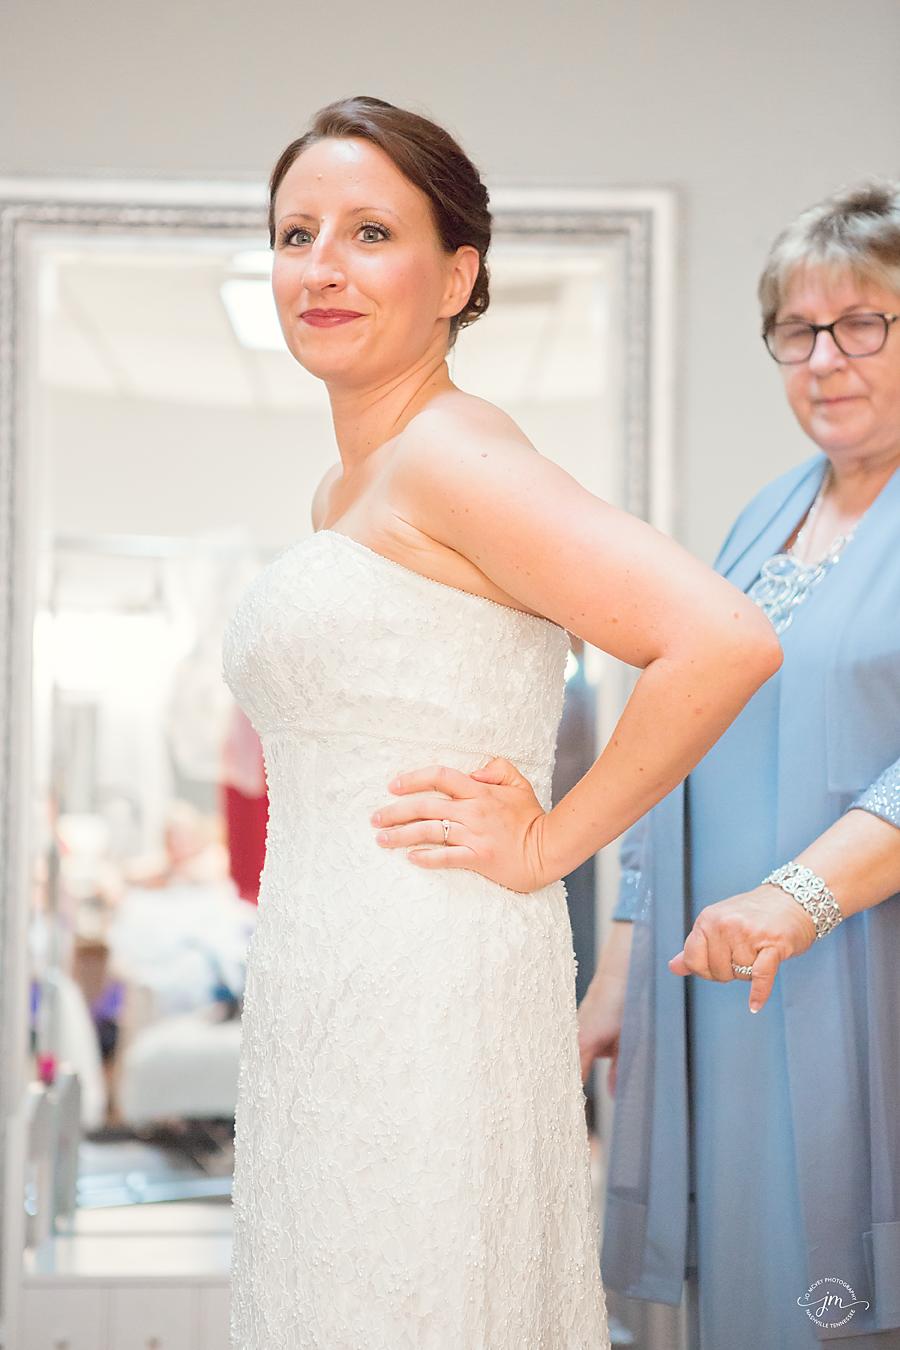 Depot Square Wedding - Gallatin, TN - Nashville Wedding Photographer - Jo McVey Photography